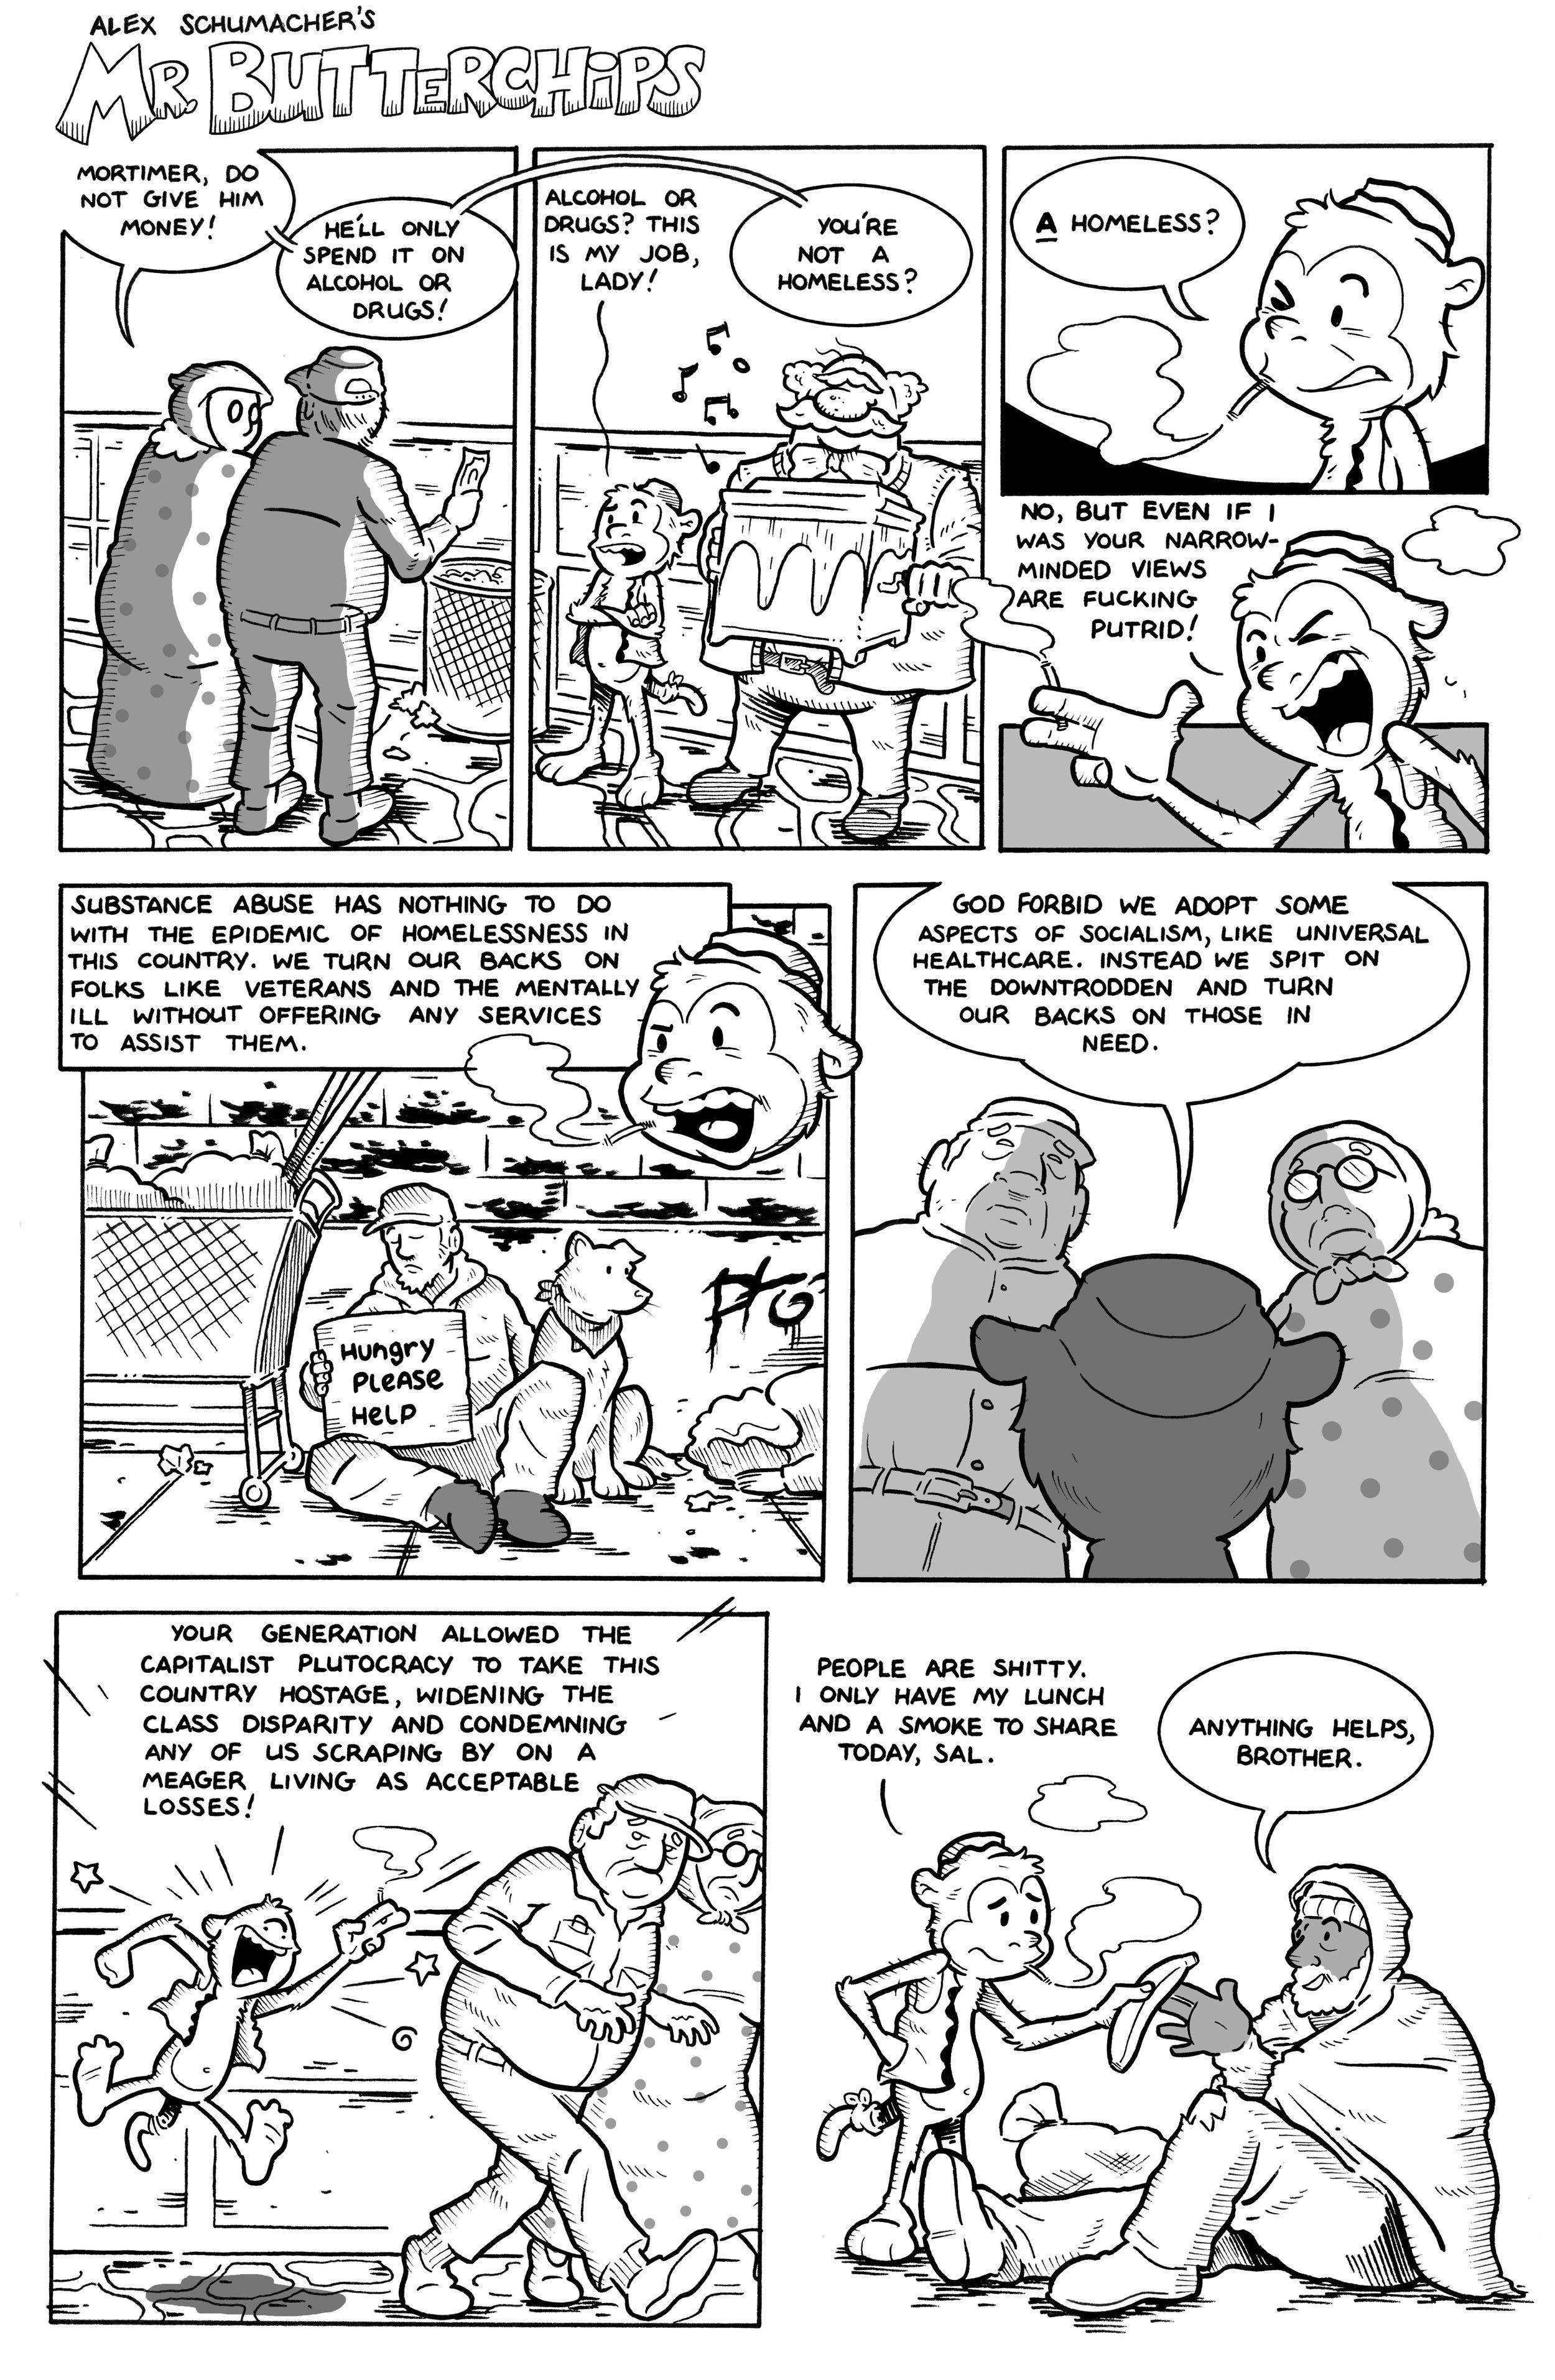 Mr. Butterchips #31 (1).jpg